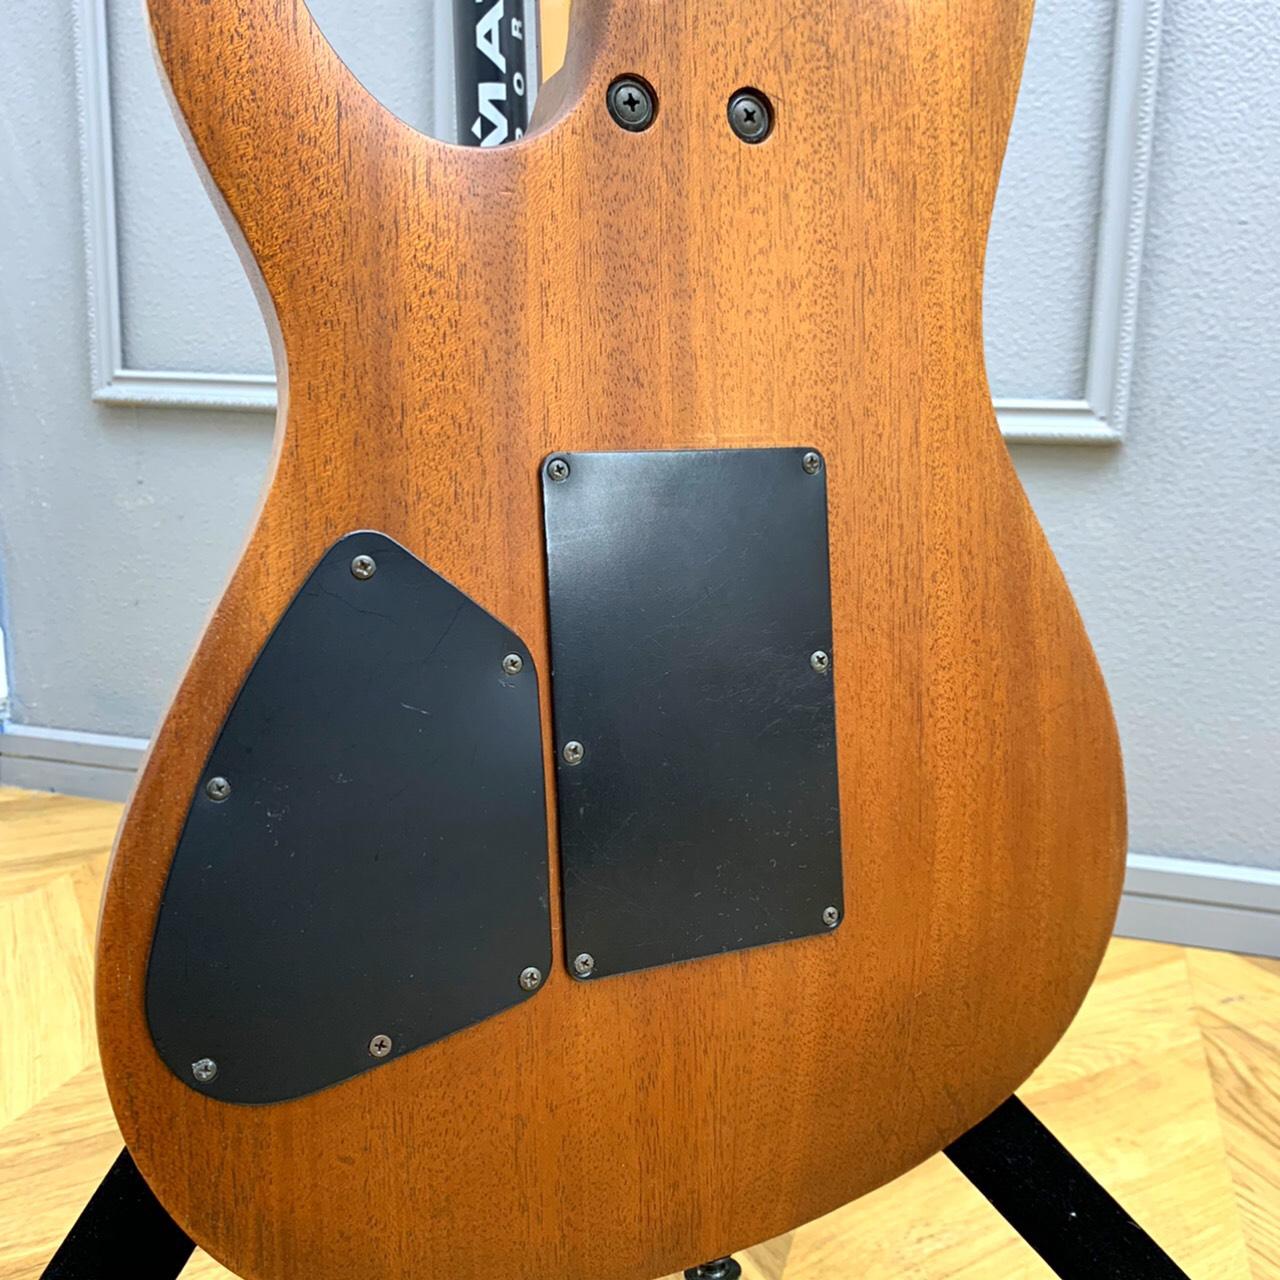 Ibanezアイバニーズ S370 エレキギター 1995年製造 国産 フジゲン オールマホガニーボディ4